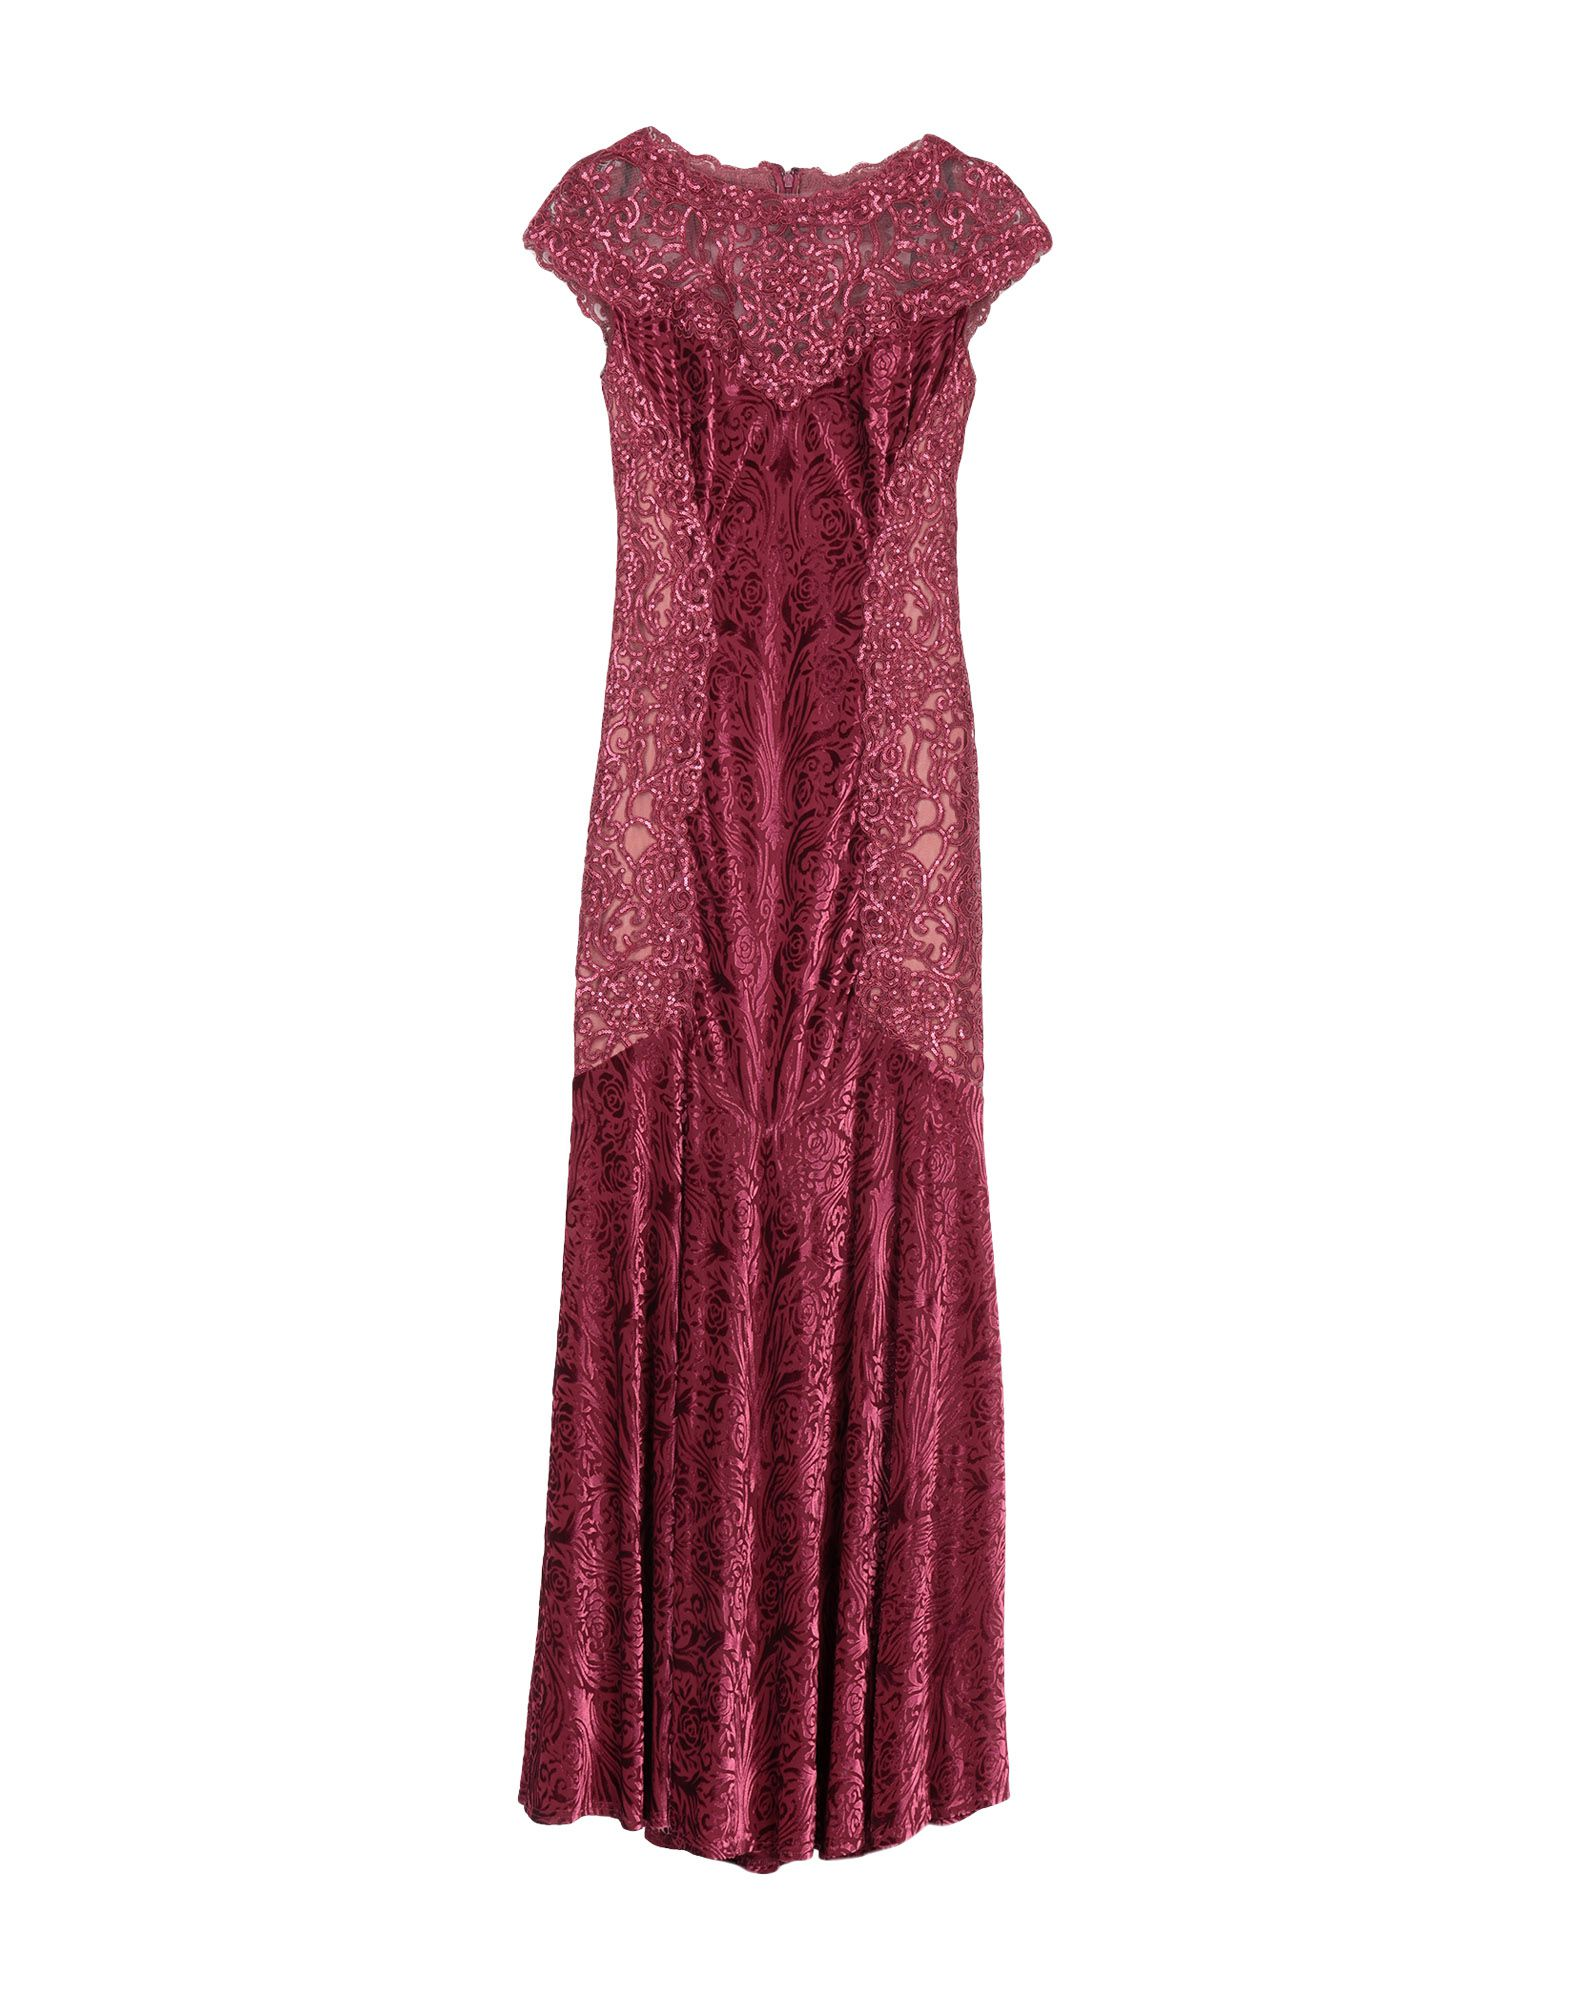 Tadashi Shoji Dresses Long dress